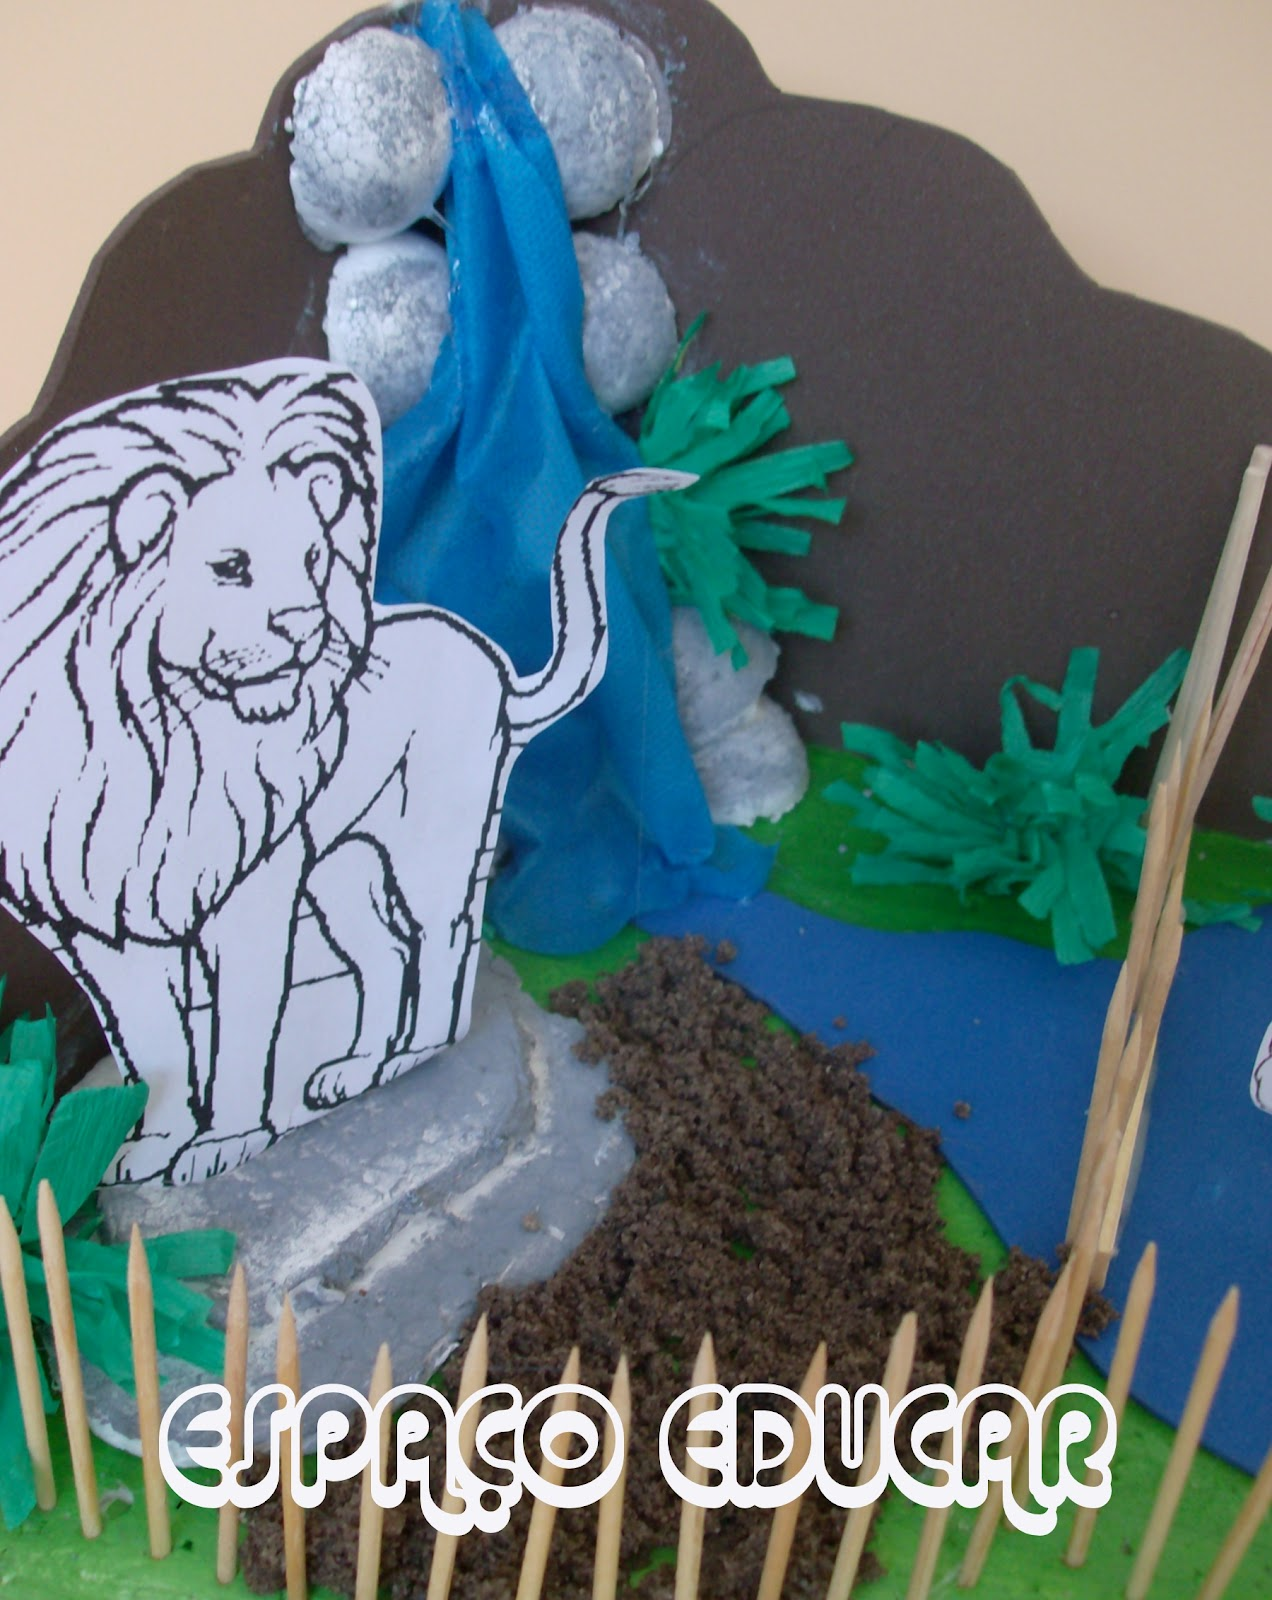 Espa o educar como fazer uma maquete de zool gico modelo for Mural de isopor e eva